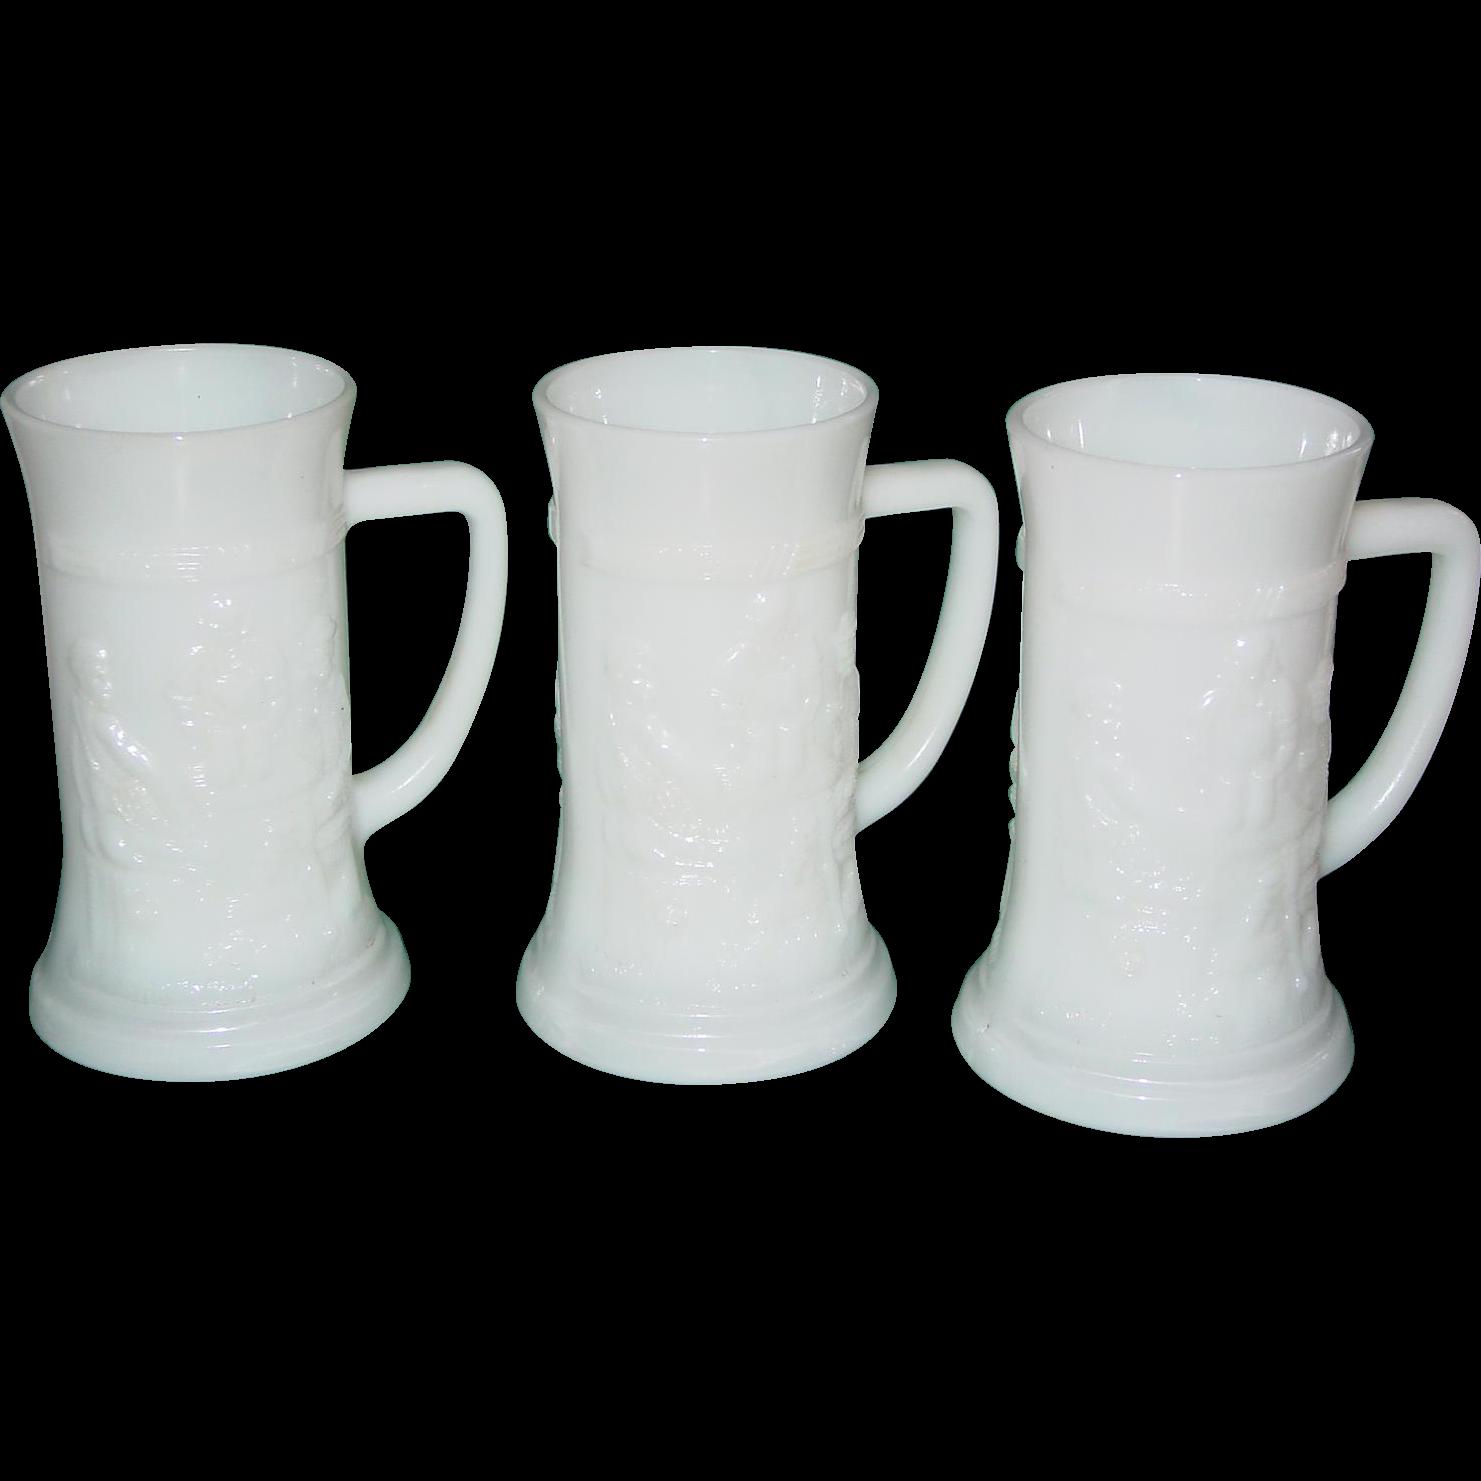 Vintage Federal Milk Glass Beer Stein Lot of 3 Tavern Pub Scene Mugs Barware